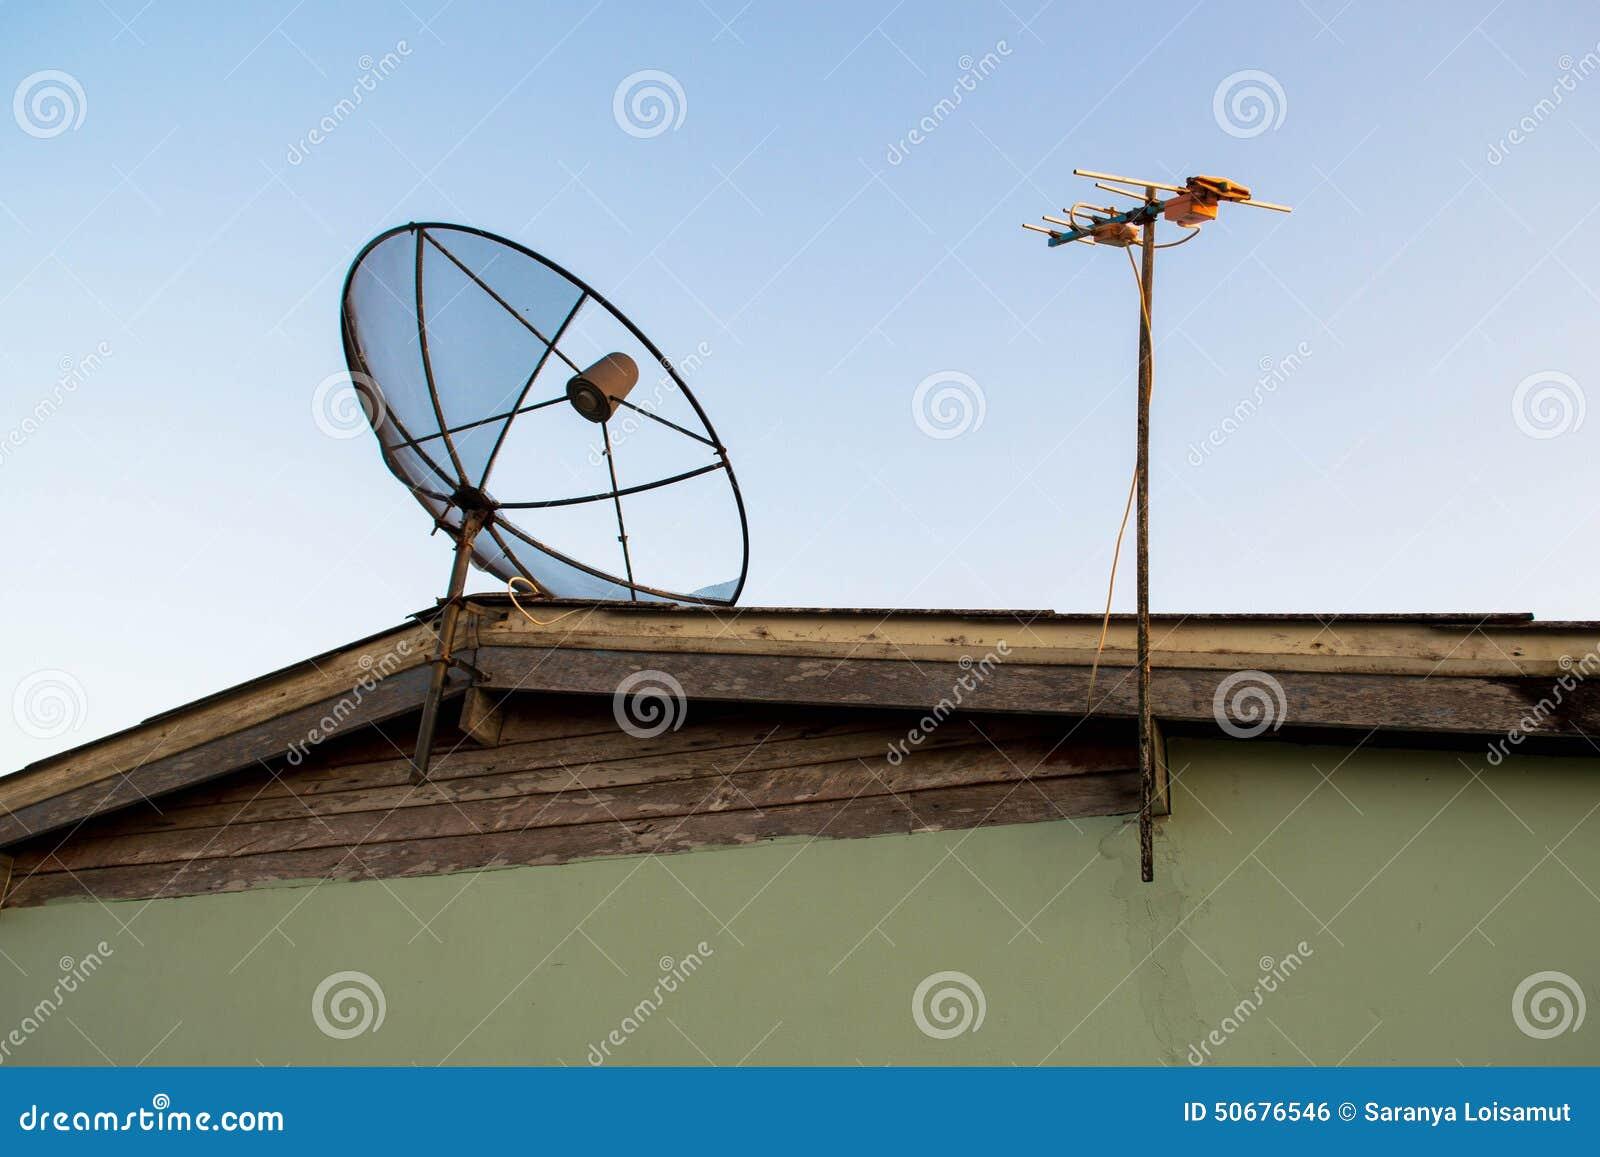 Download 在屋顶的卫星盘天线 库存照片. 图片 包括有 程序, 通信, 互联网, 数字式, 电池, 抛物面, 收音机 - 50676546